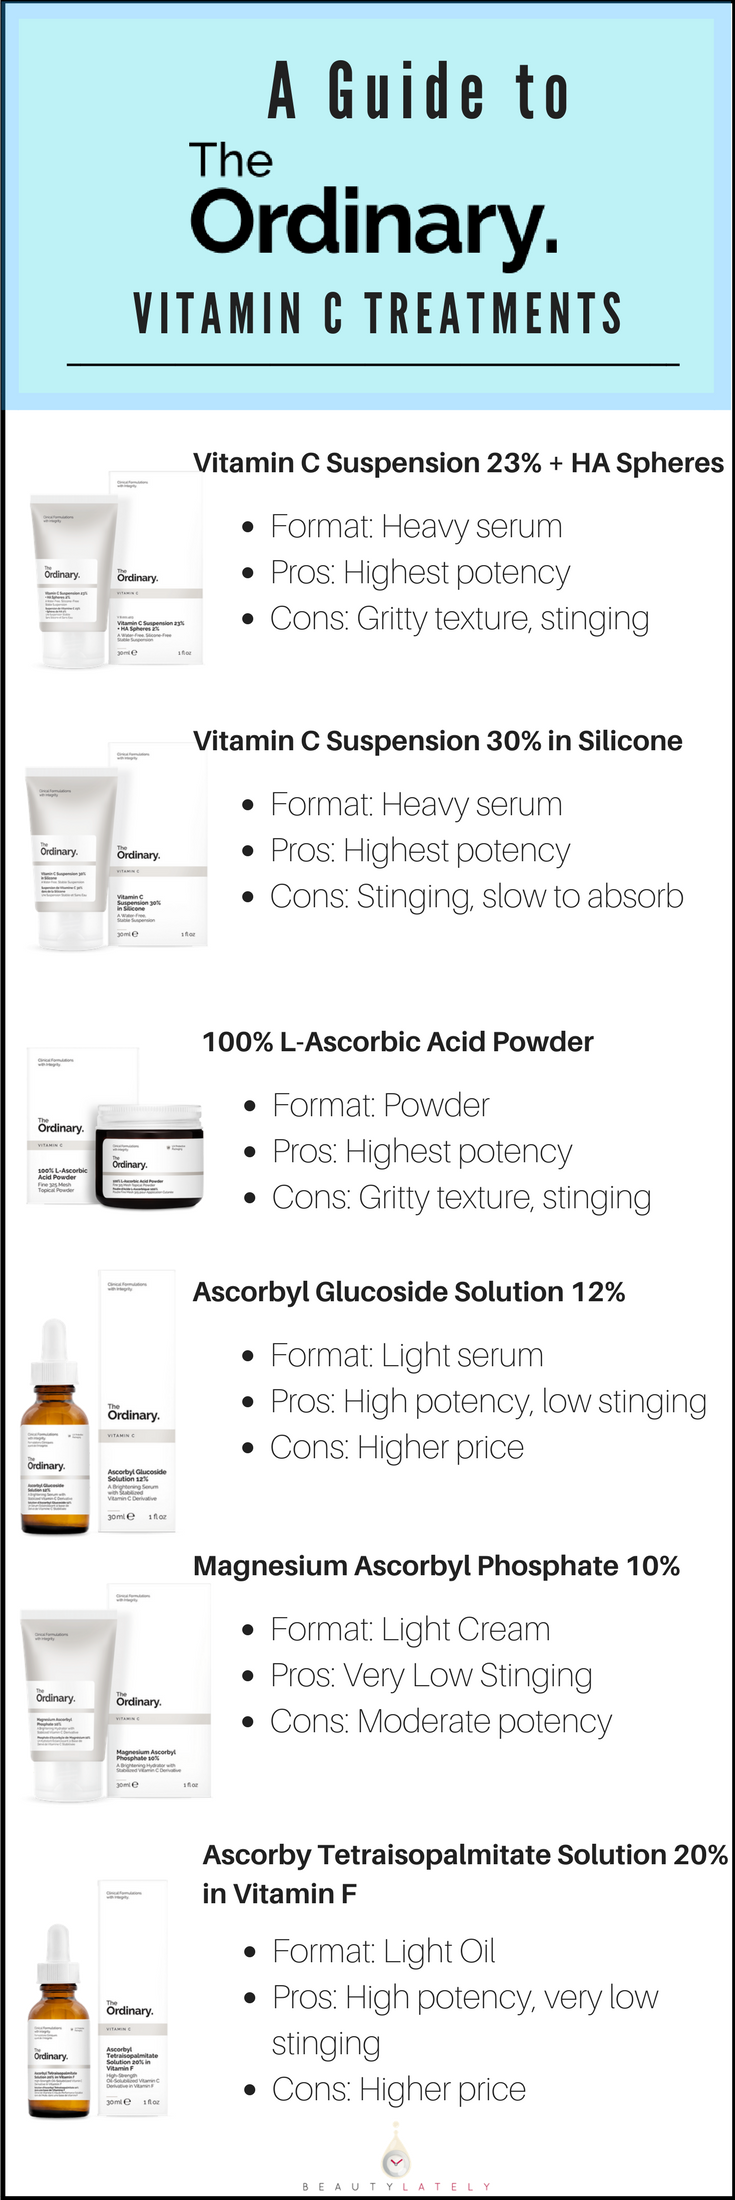 Best The Ordinary Treatments For Dark Spots The Ordinary For Dark Spots Skin Treatments Dark Spot Treatment